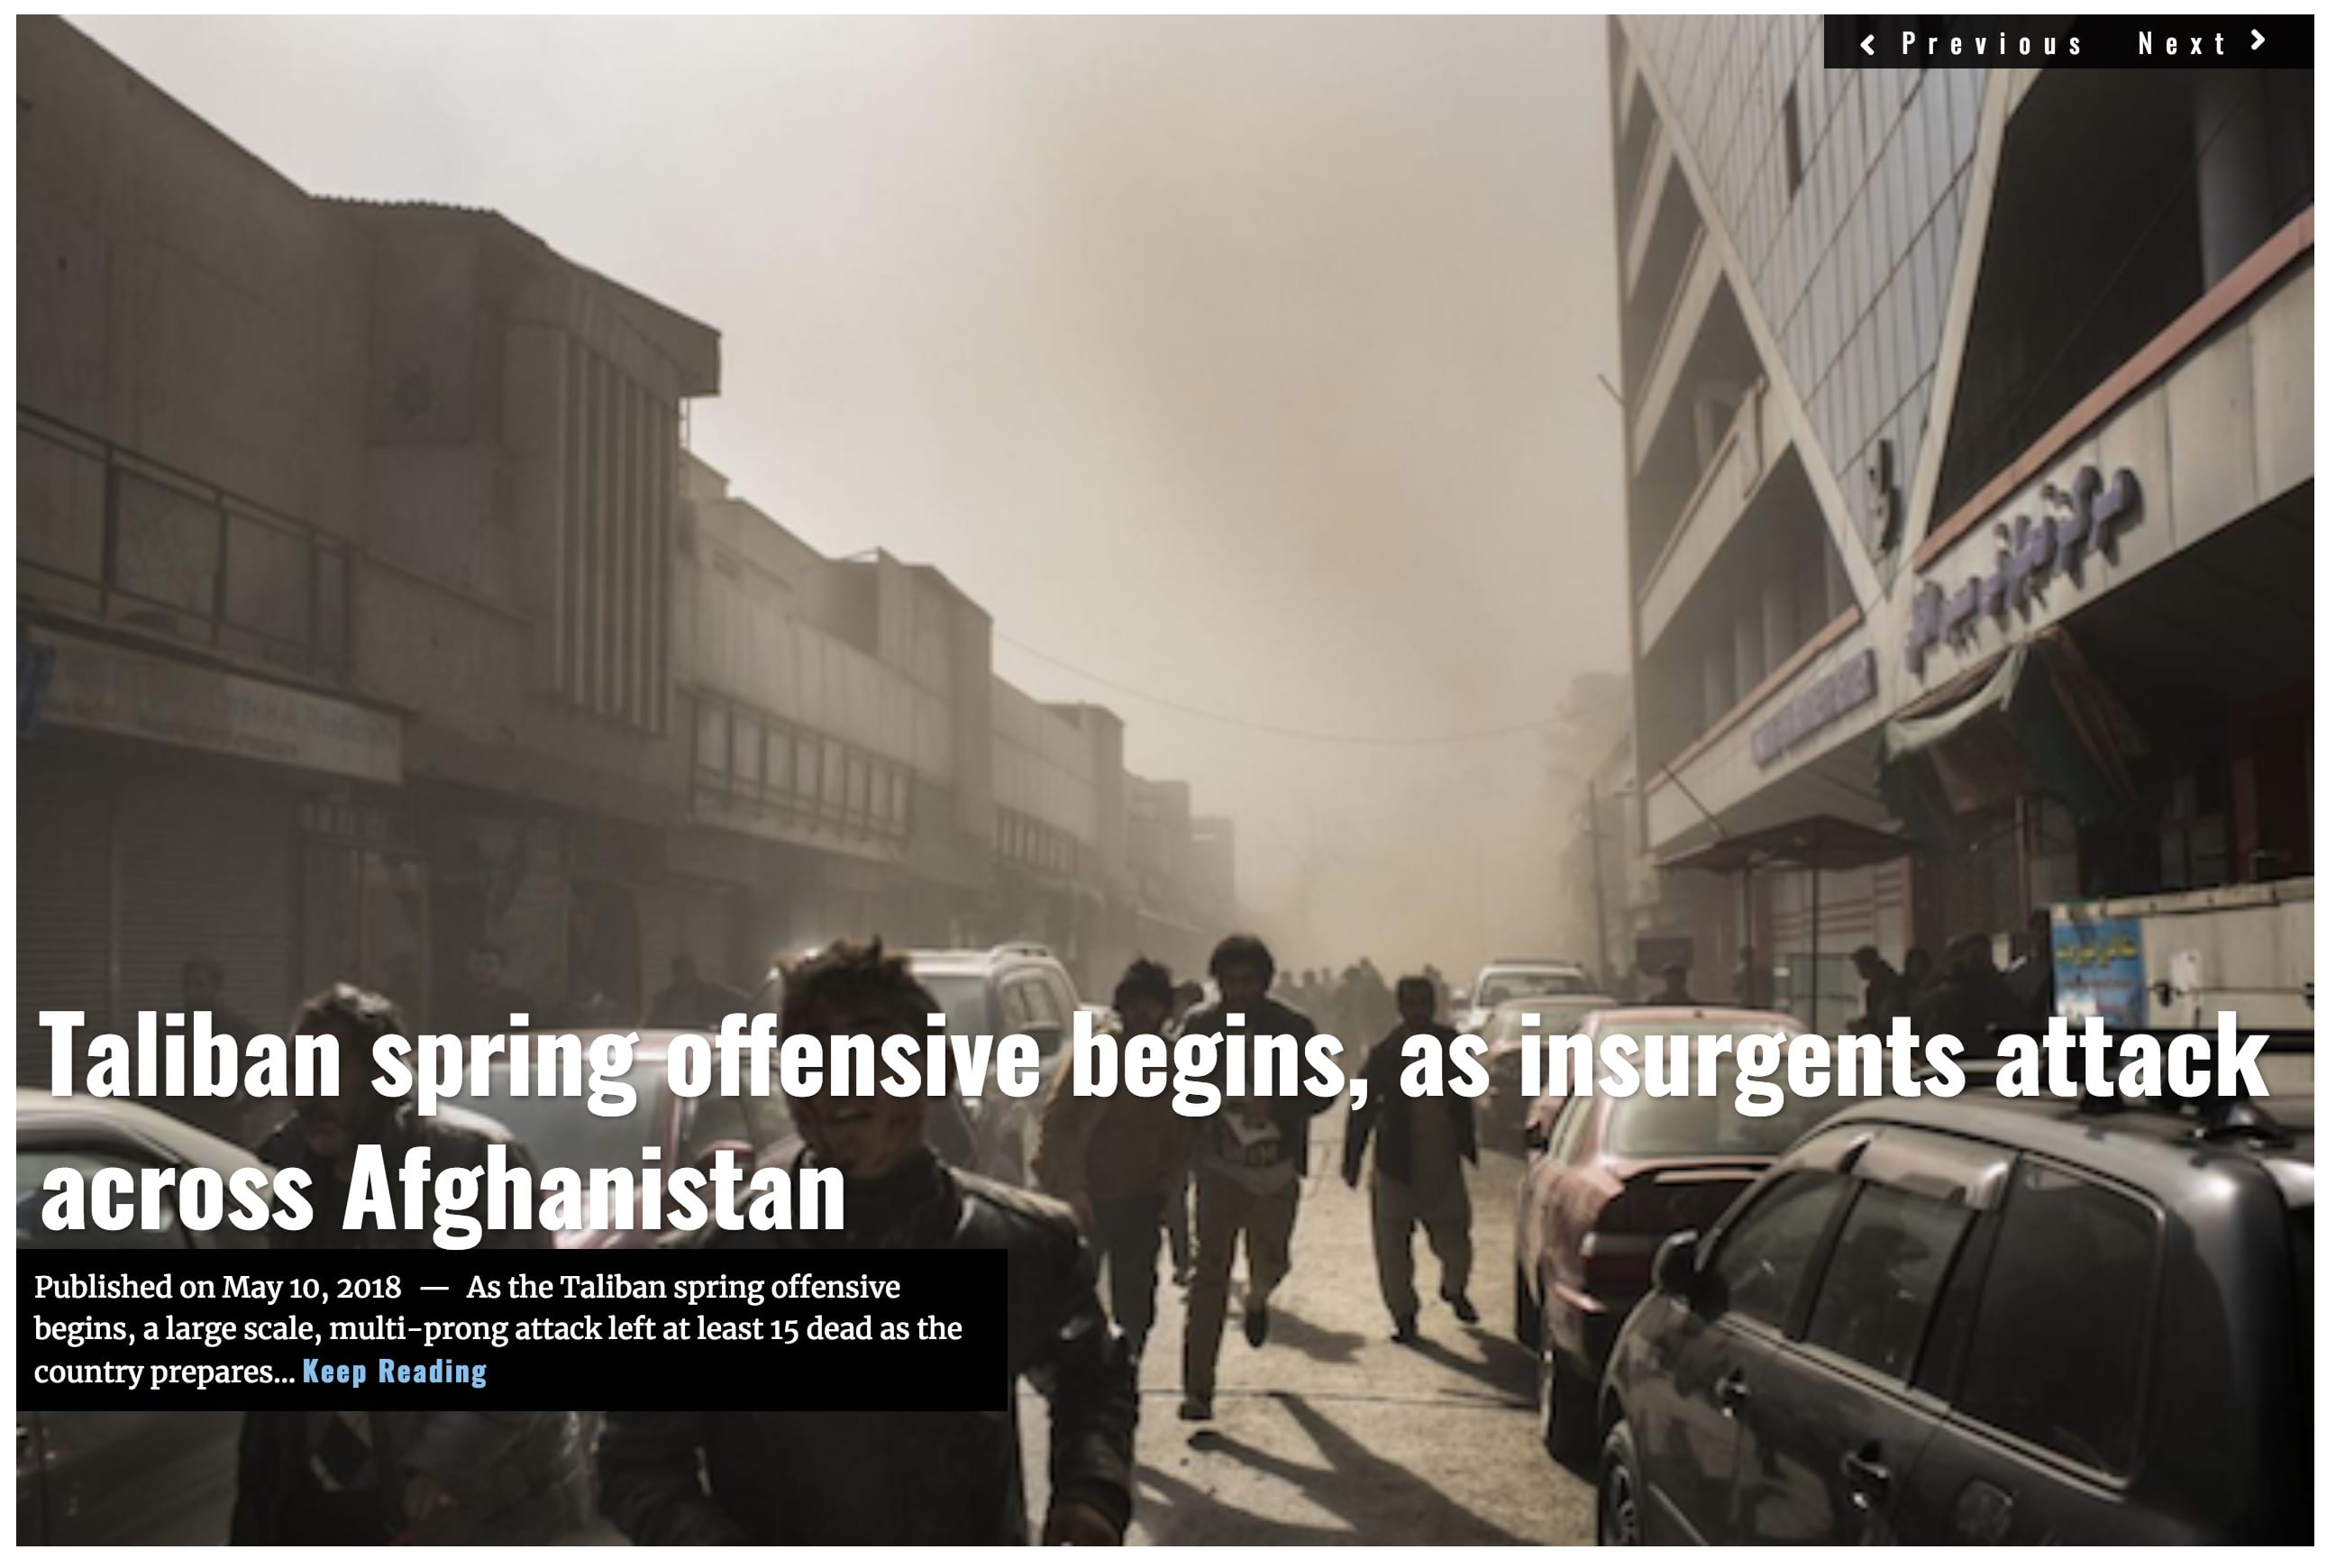 Image Lima Charlie News Headline Taliban Spring Offensive J.Sjoholm MAY 10 2018